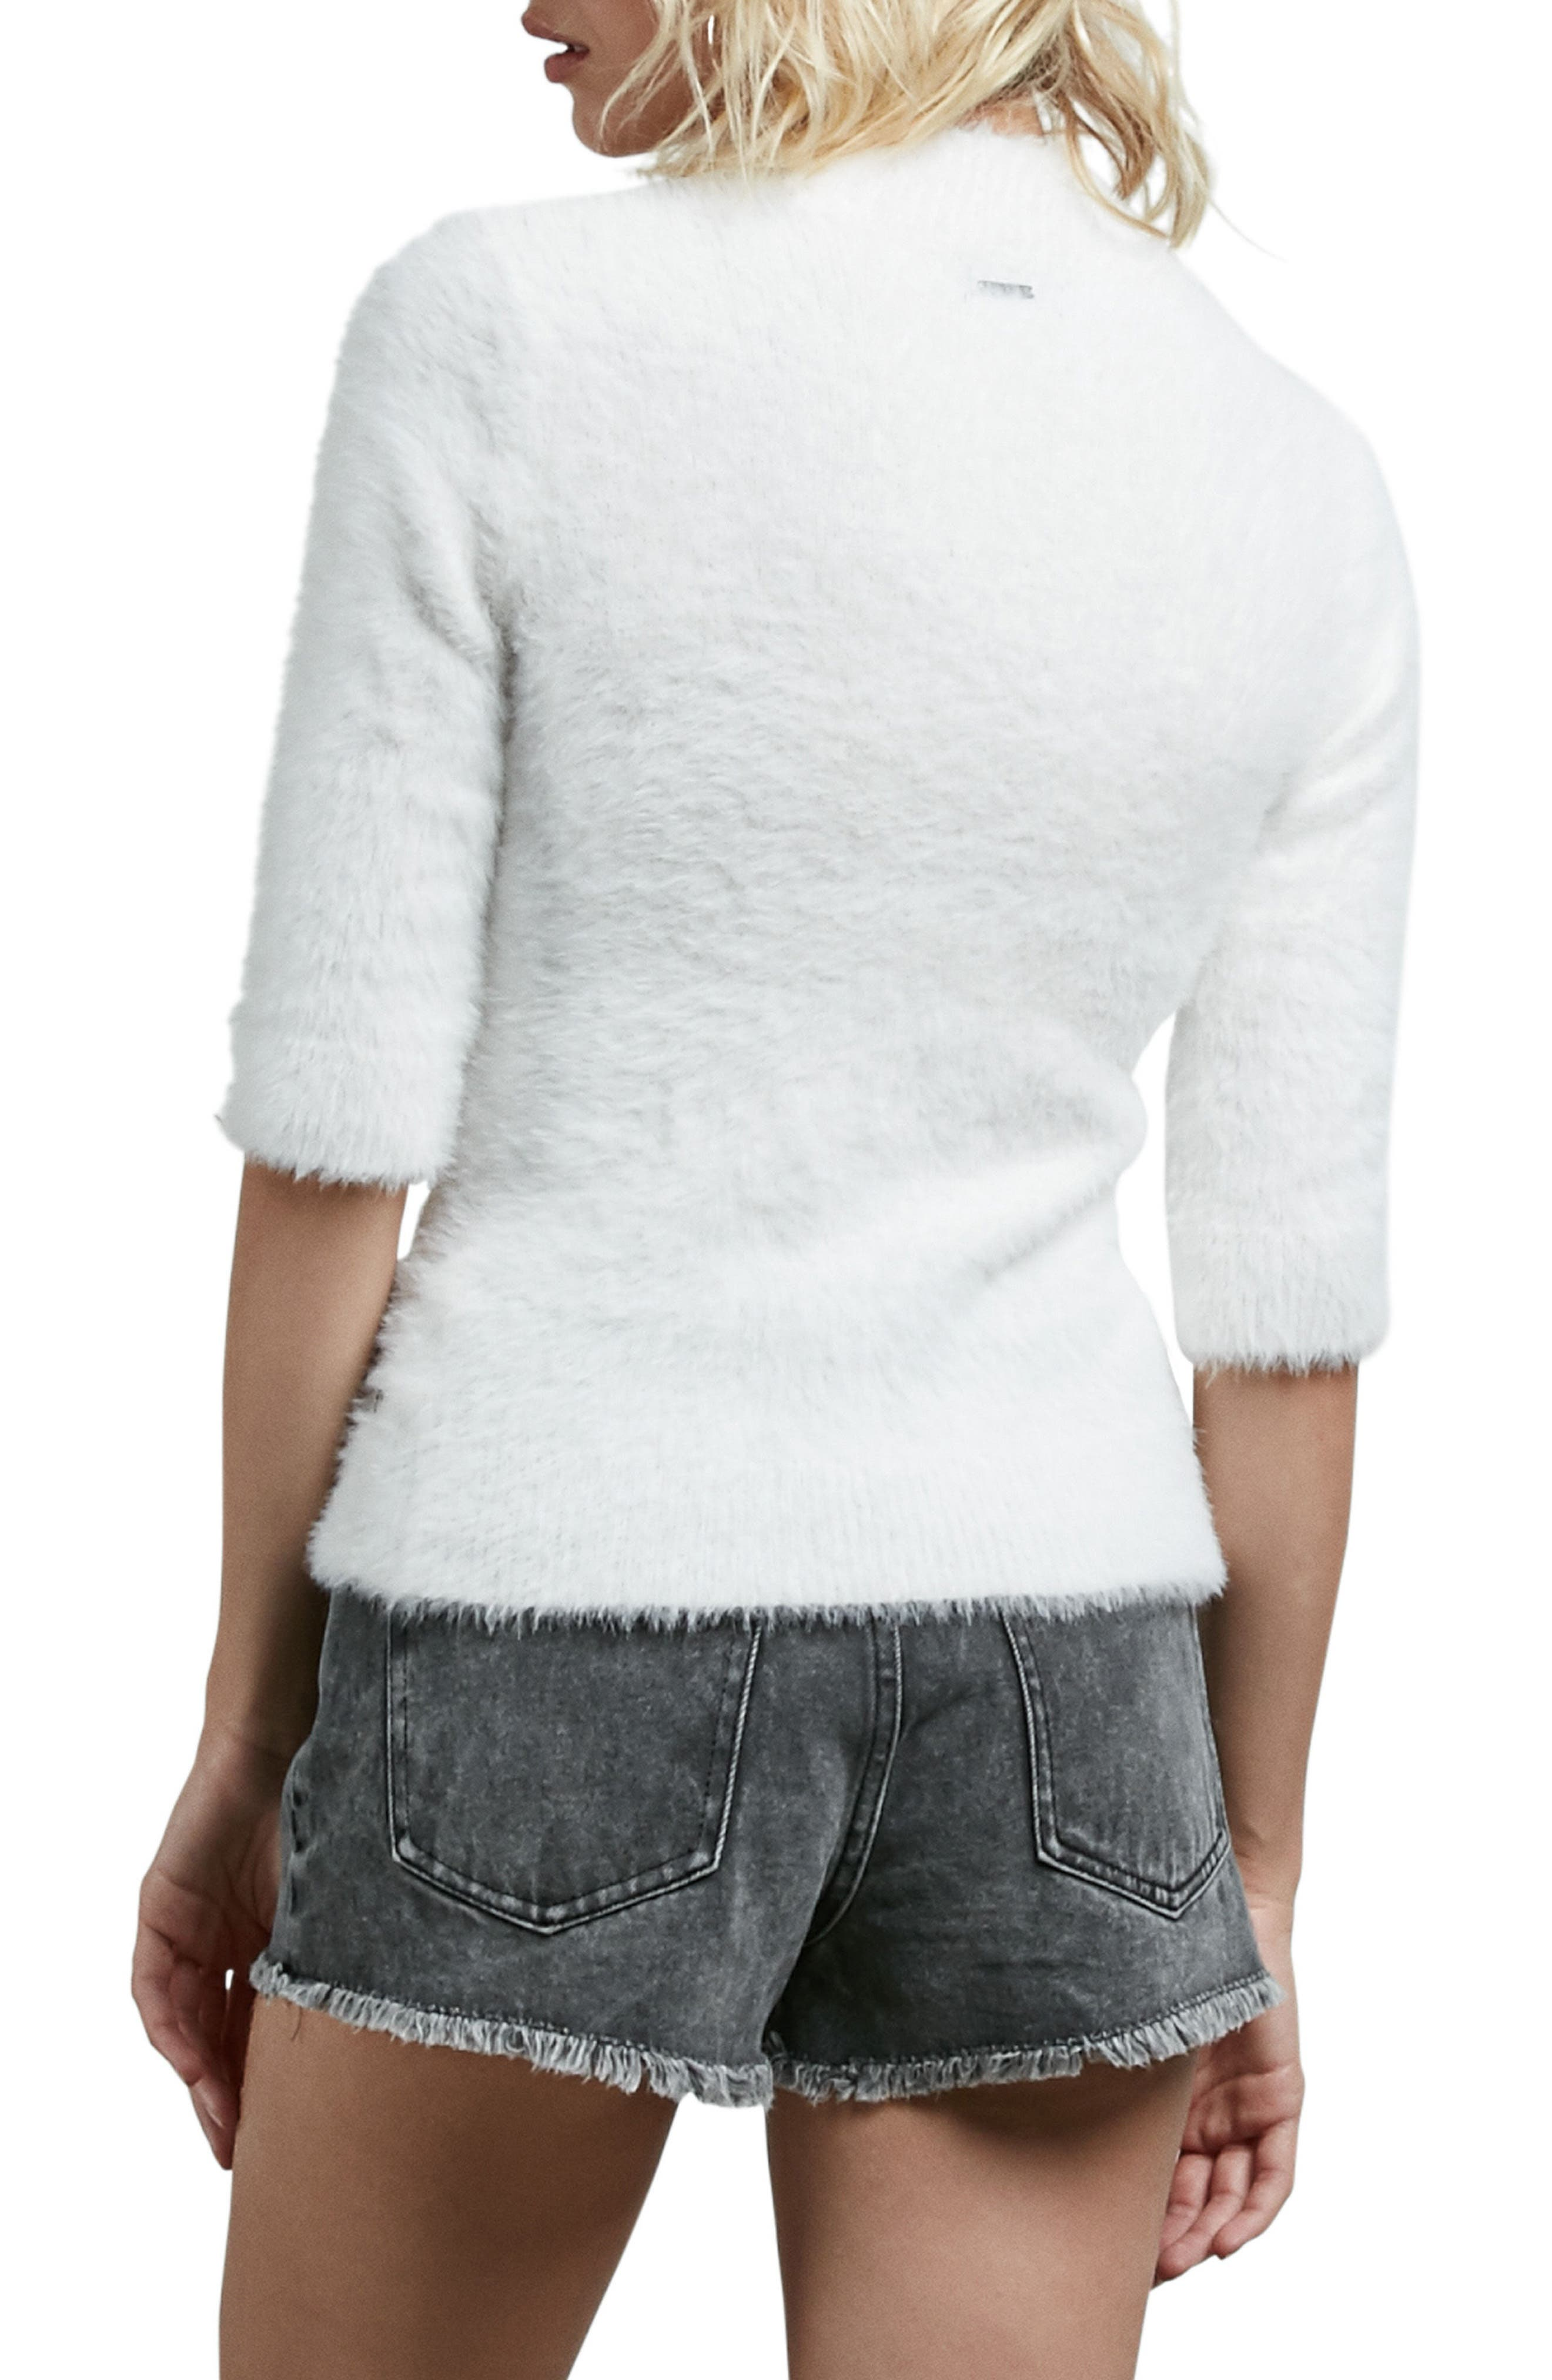 Bunney Riot Sweater,                             Alternate thumbnail 2, color,                             Star Wht